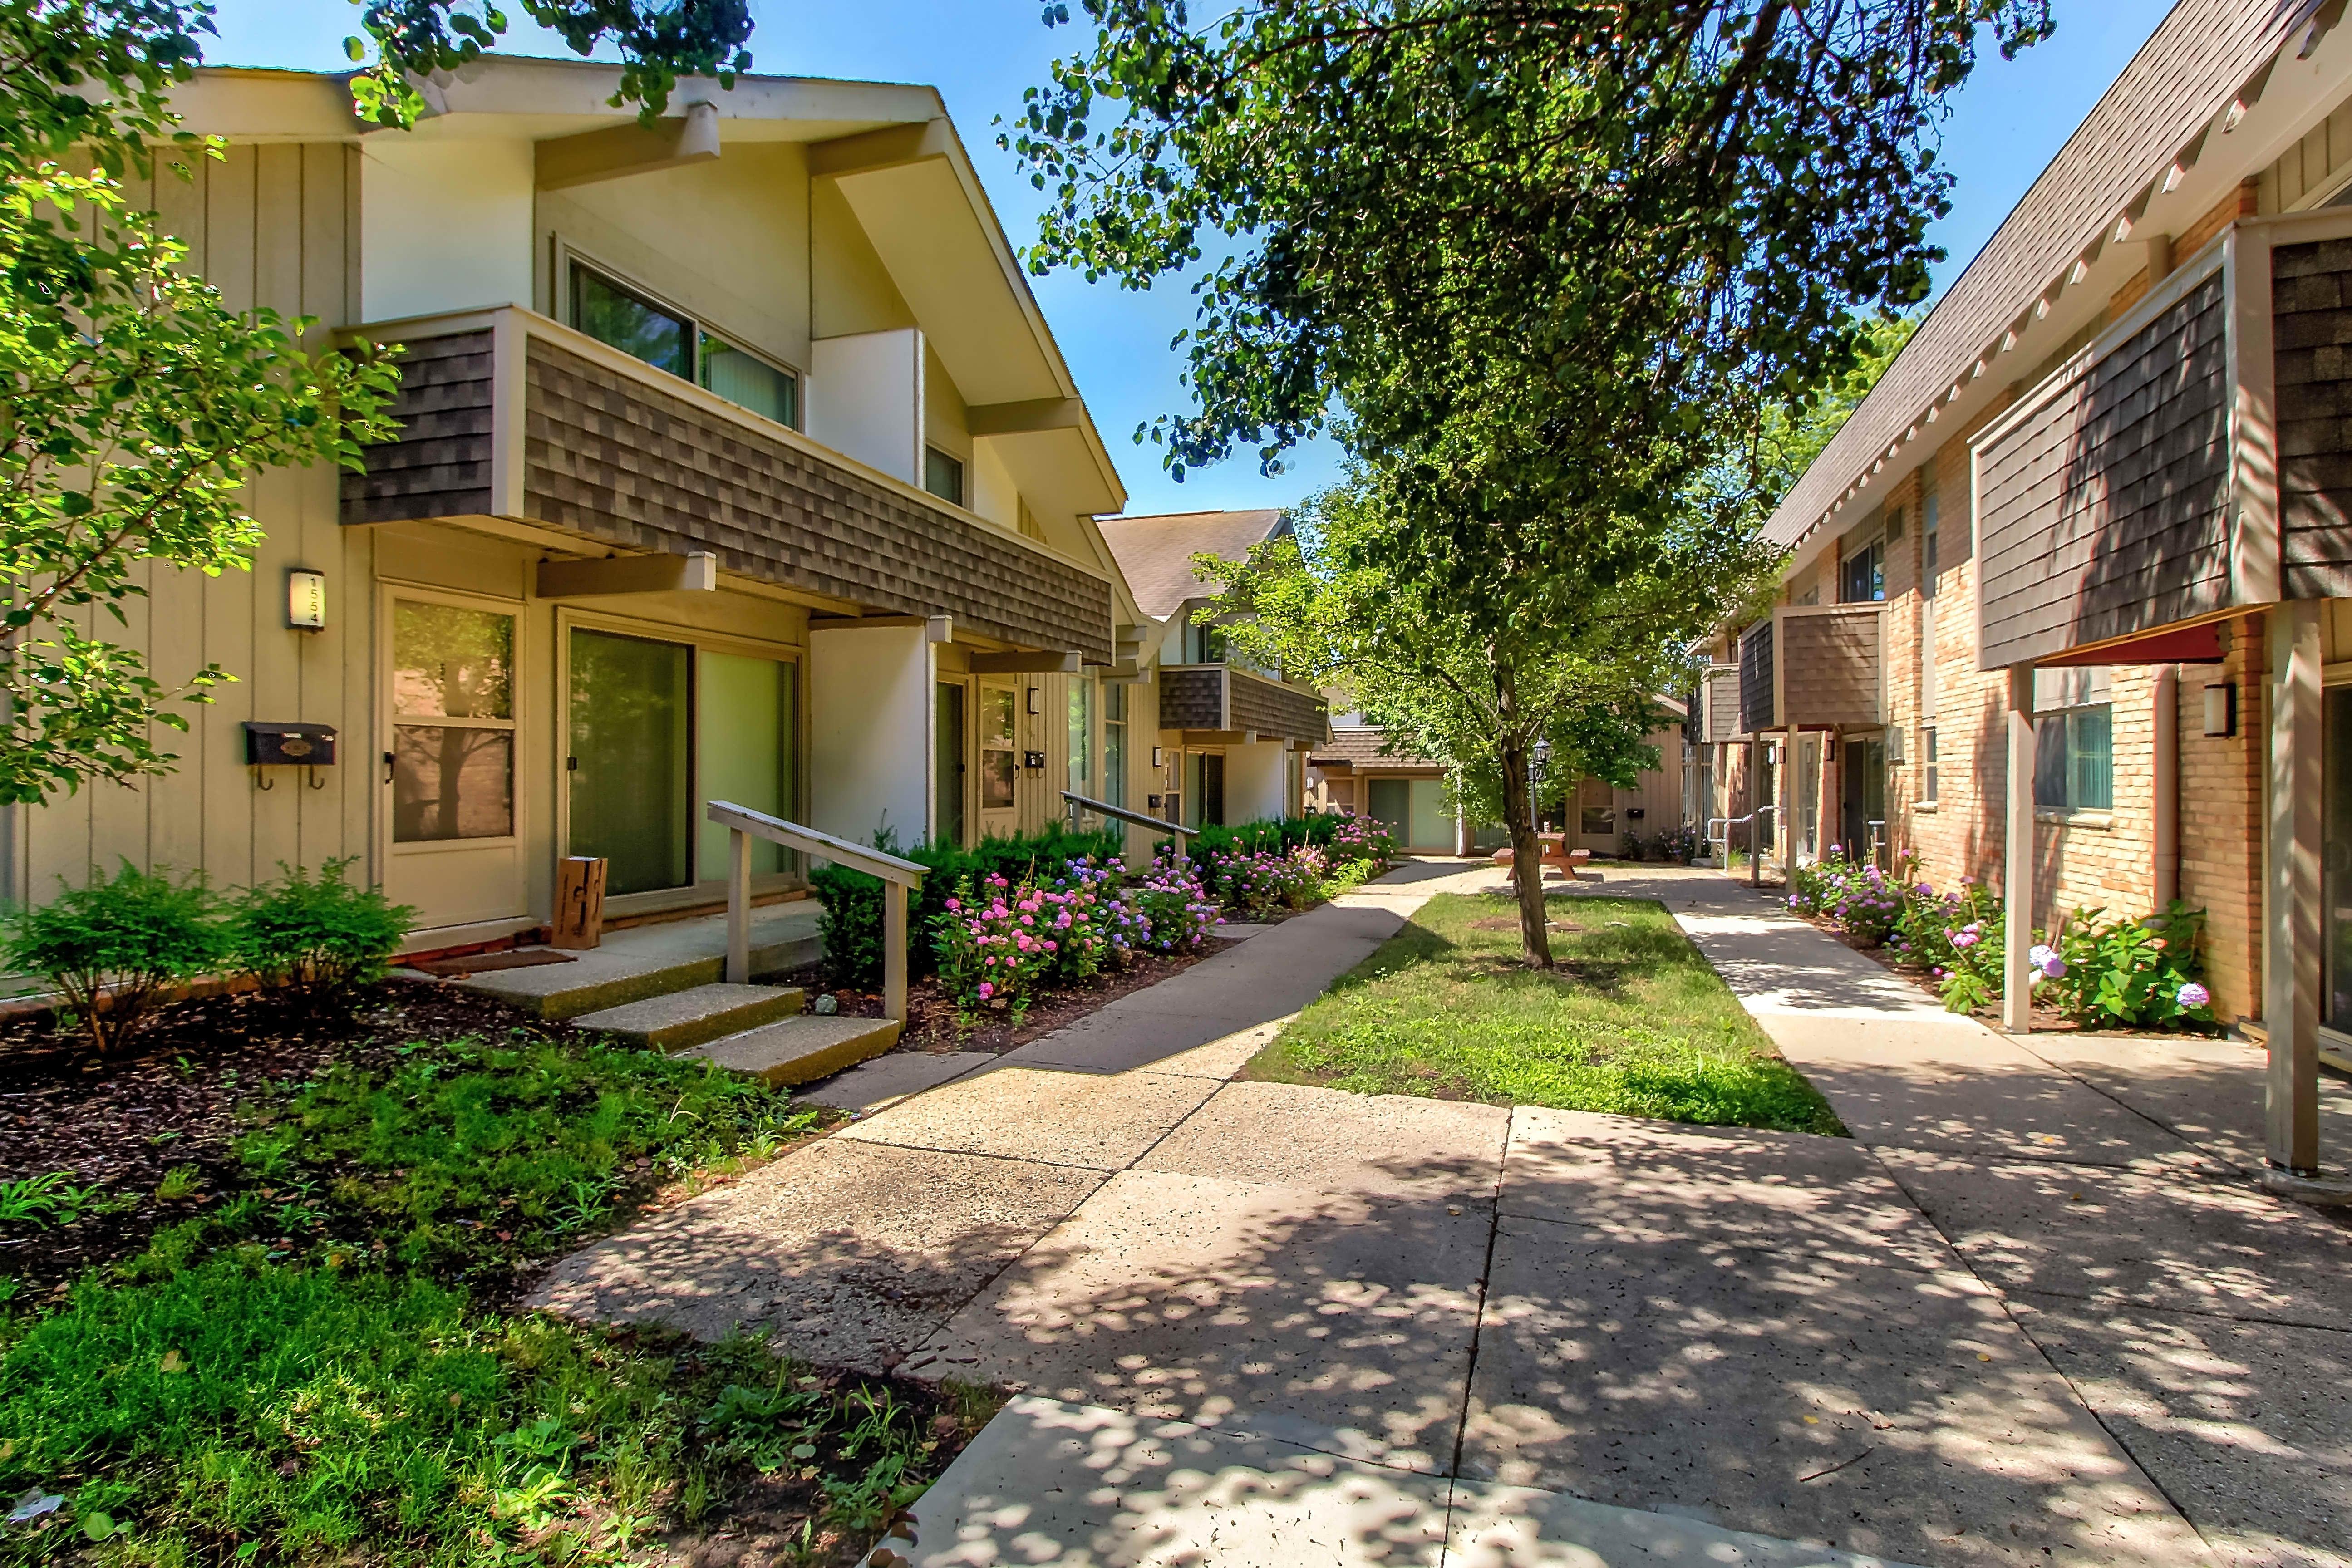 Pine Valley Apartments, Ann Arbor MI - Walk Score